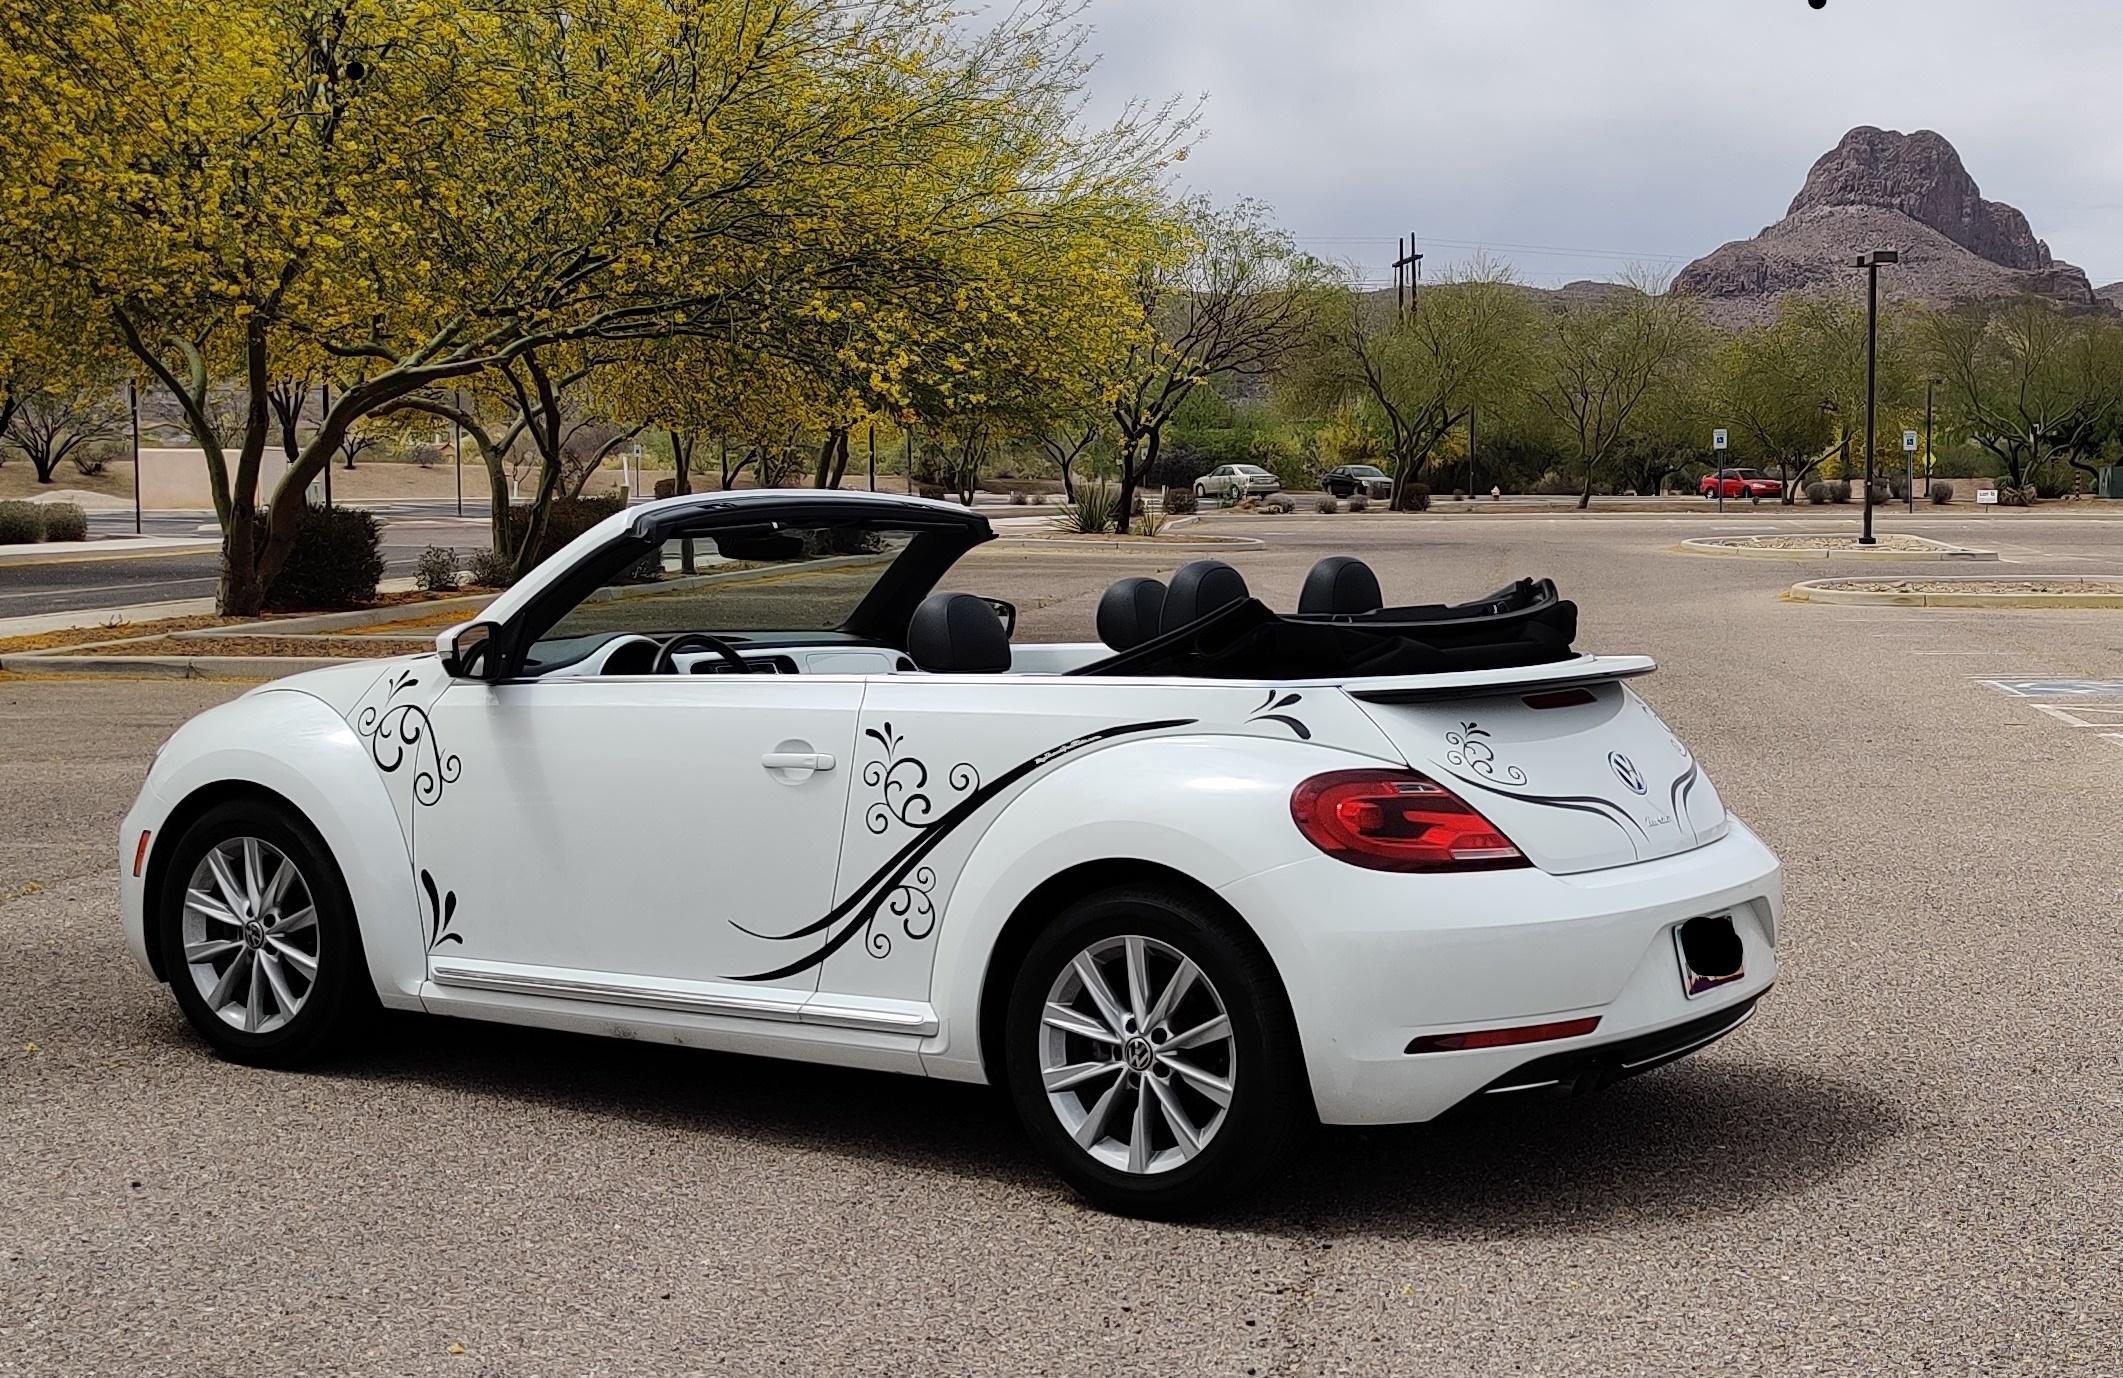 White VW Beetle with decal Arizona desert